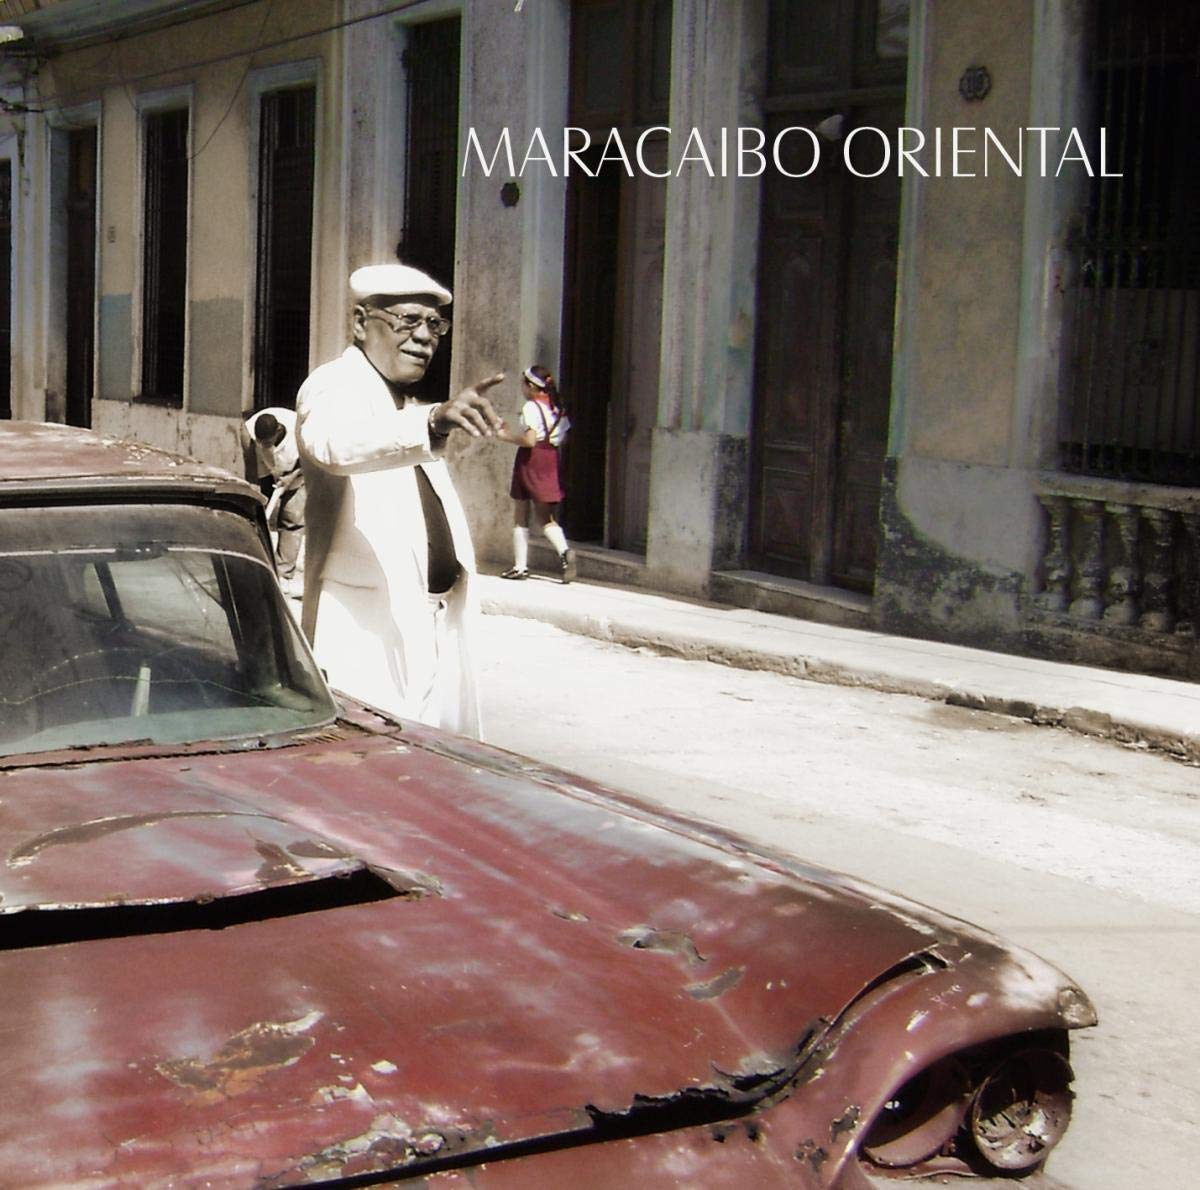 Maracaibo Manufacturer regenerated product Fashionable Oriental